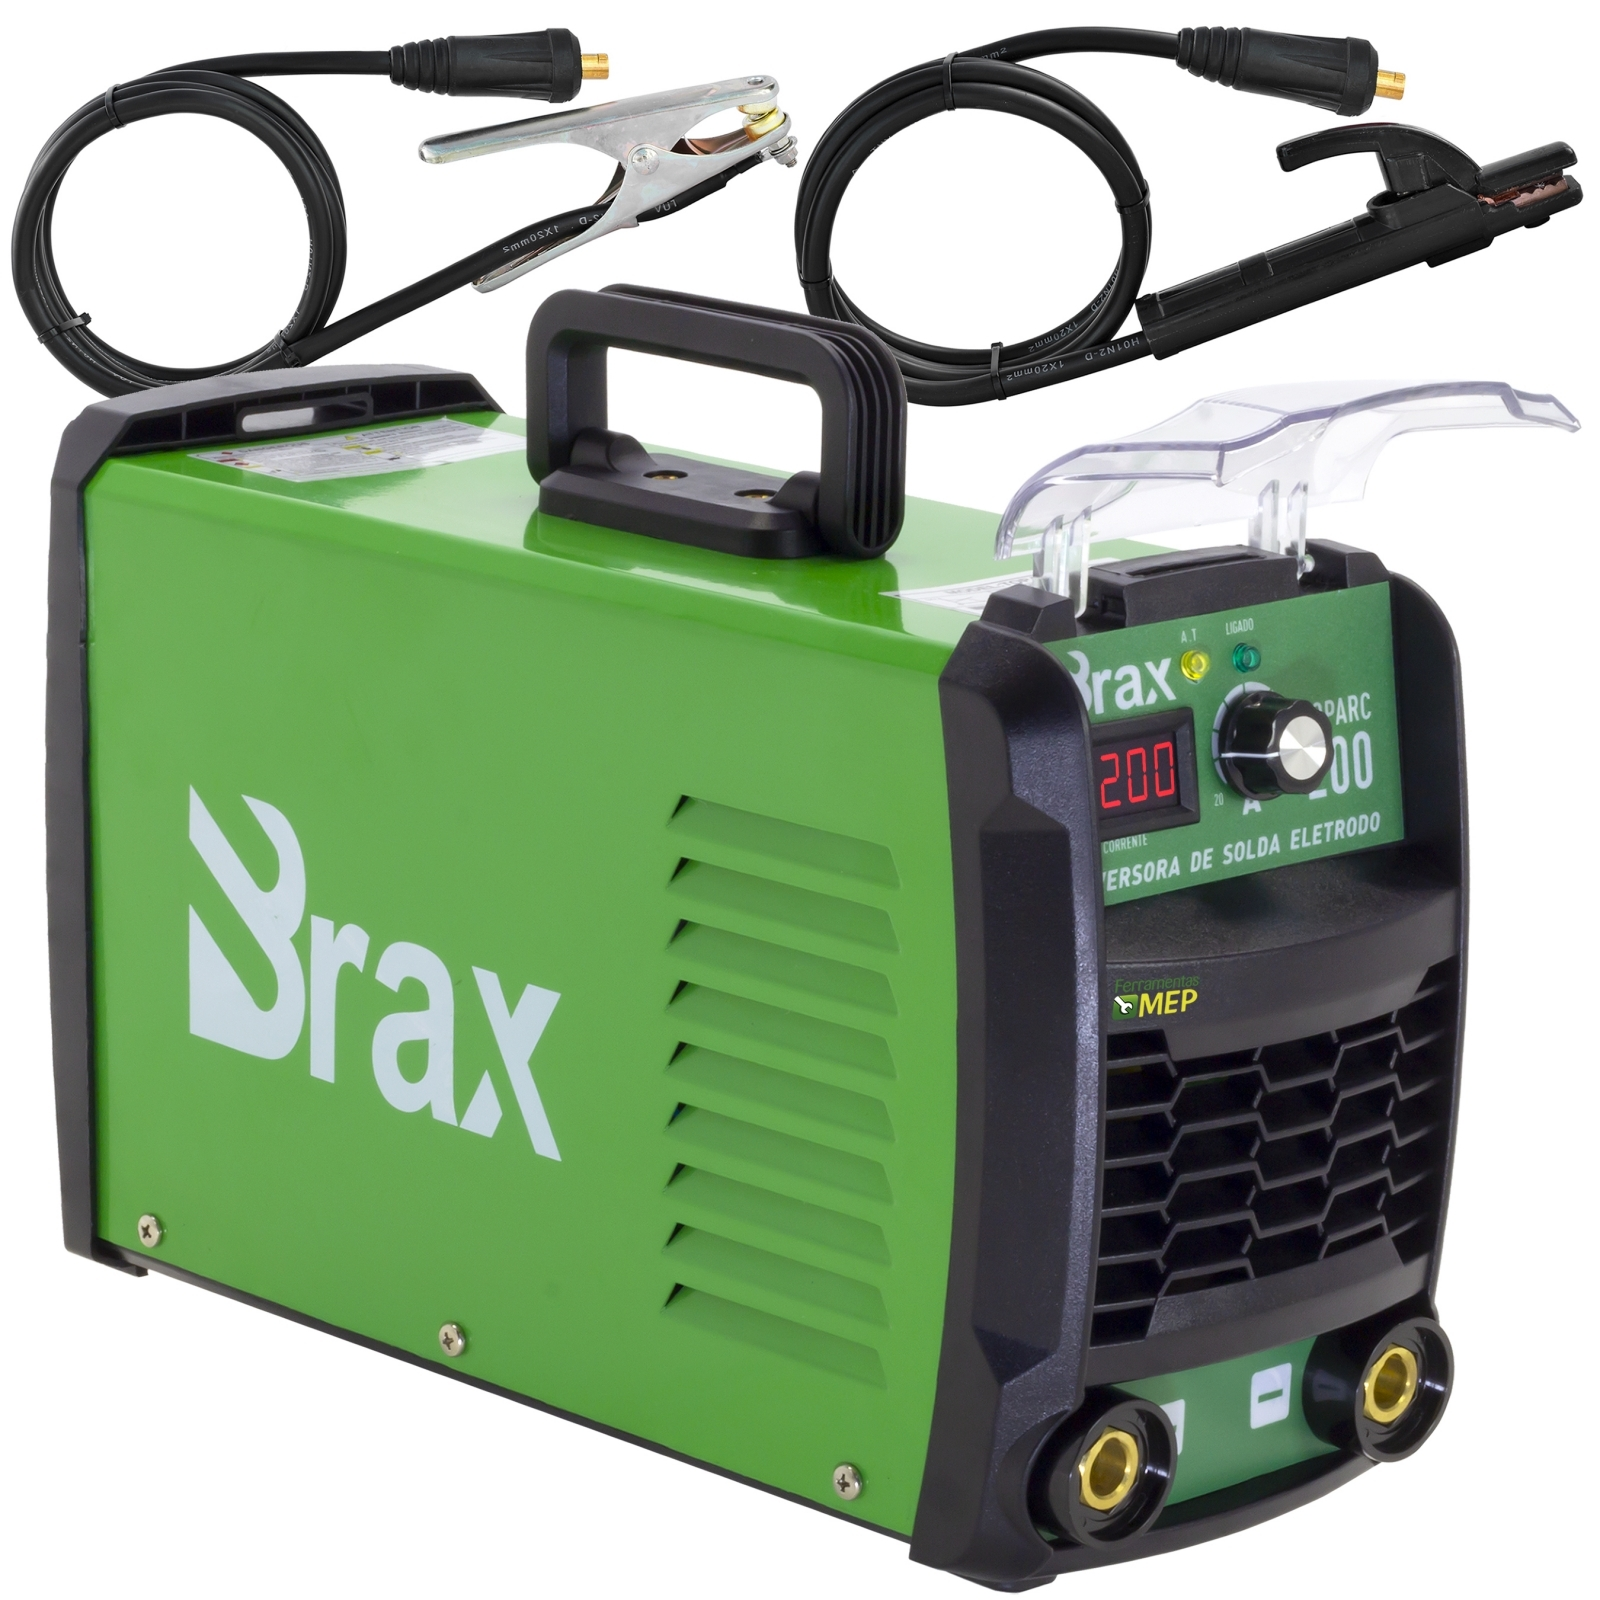 Máquina Solda Inversora Brax 200amp Mma eletrodo Ou Tig Bivolt Bx7 - Ferramentas MEP